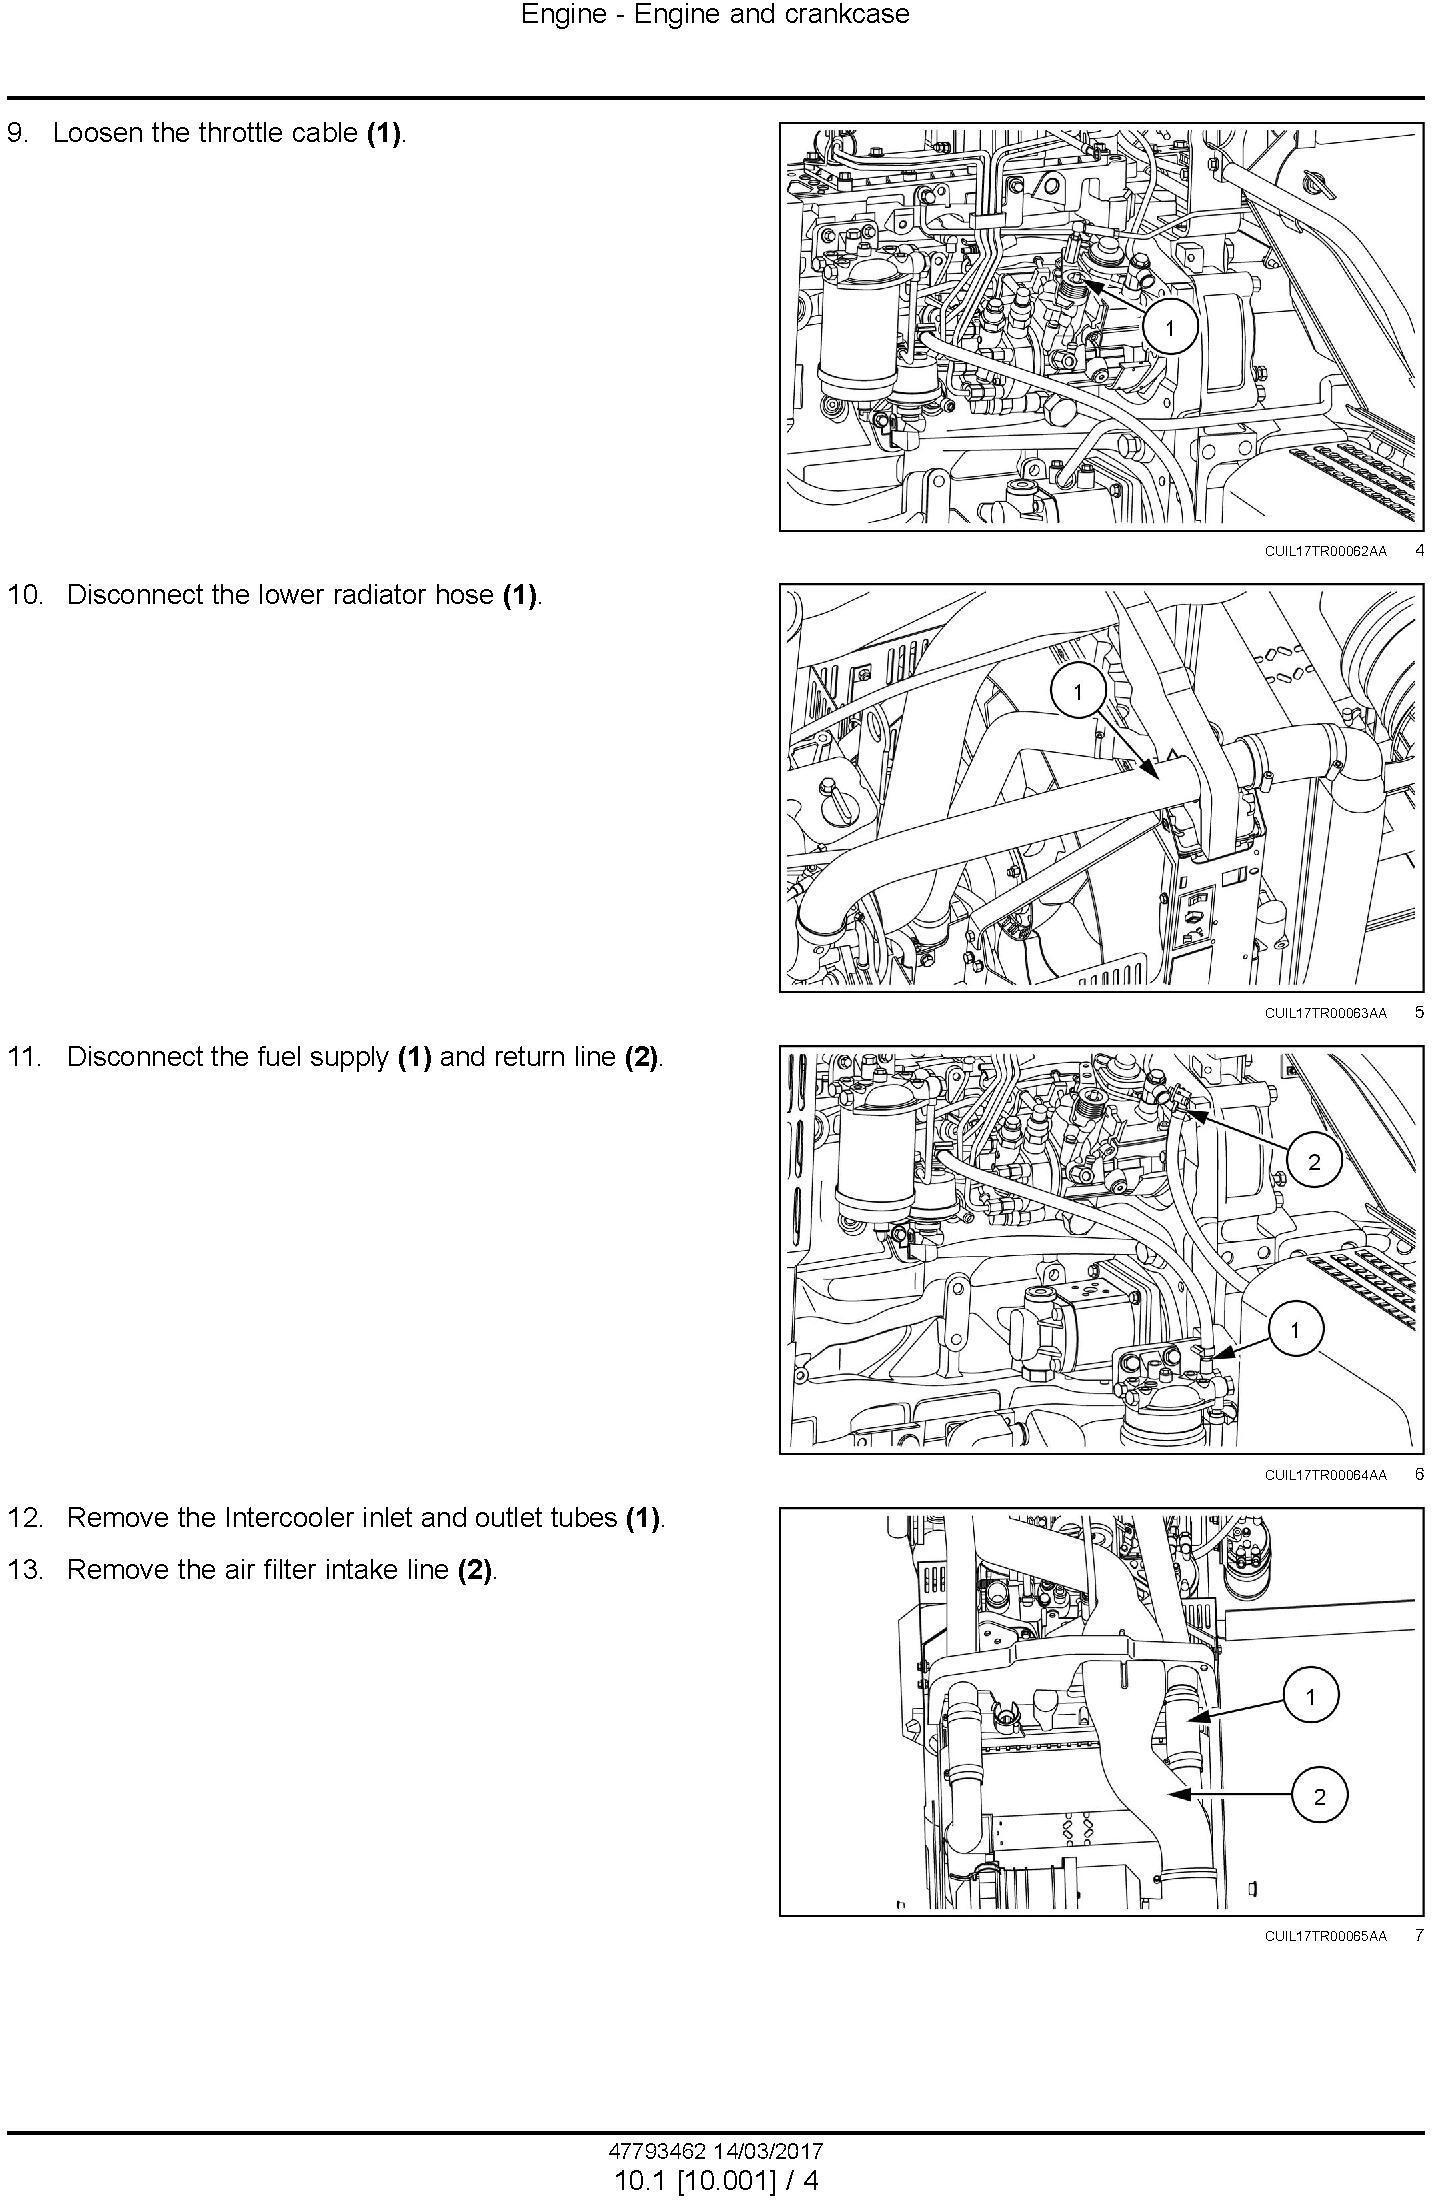 New Holland 7630, 8030 Tier 3 Tractors Service Manual - 1